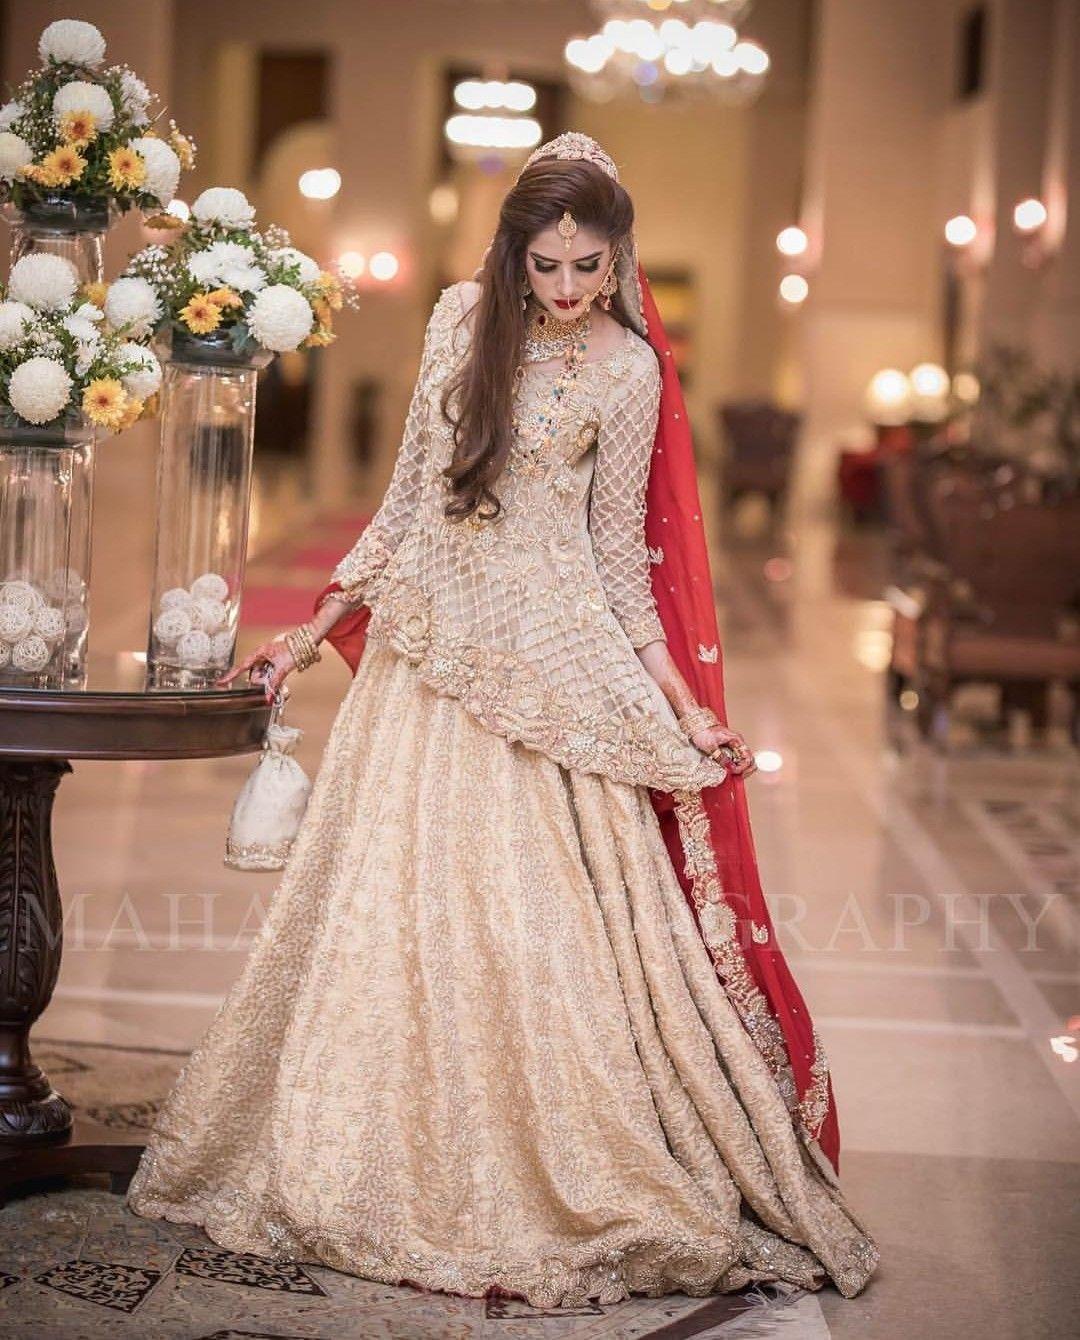 Pin von Meera Farooqui auf pak brides   Pinterest